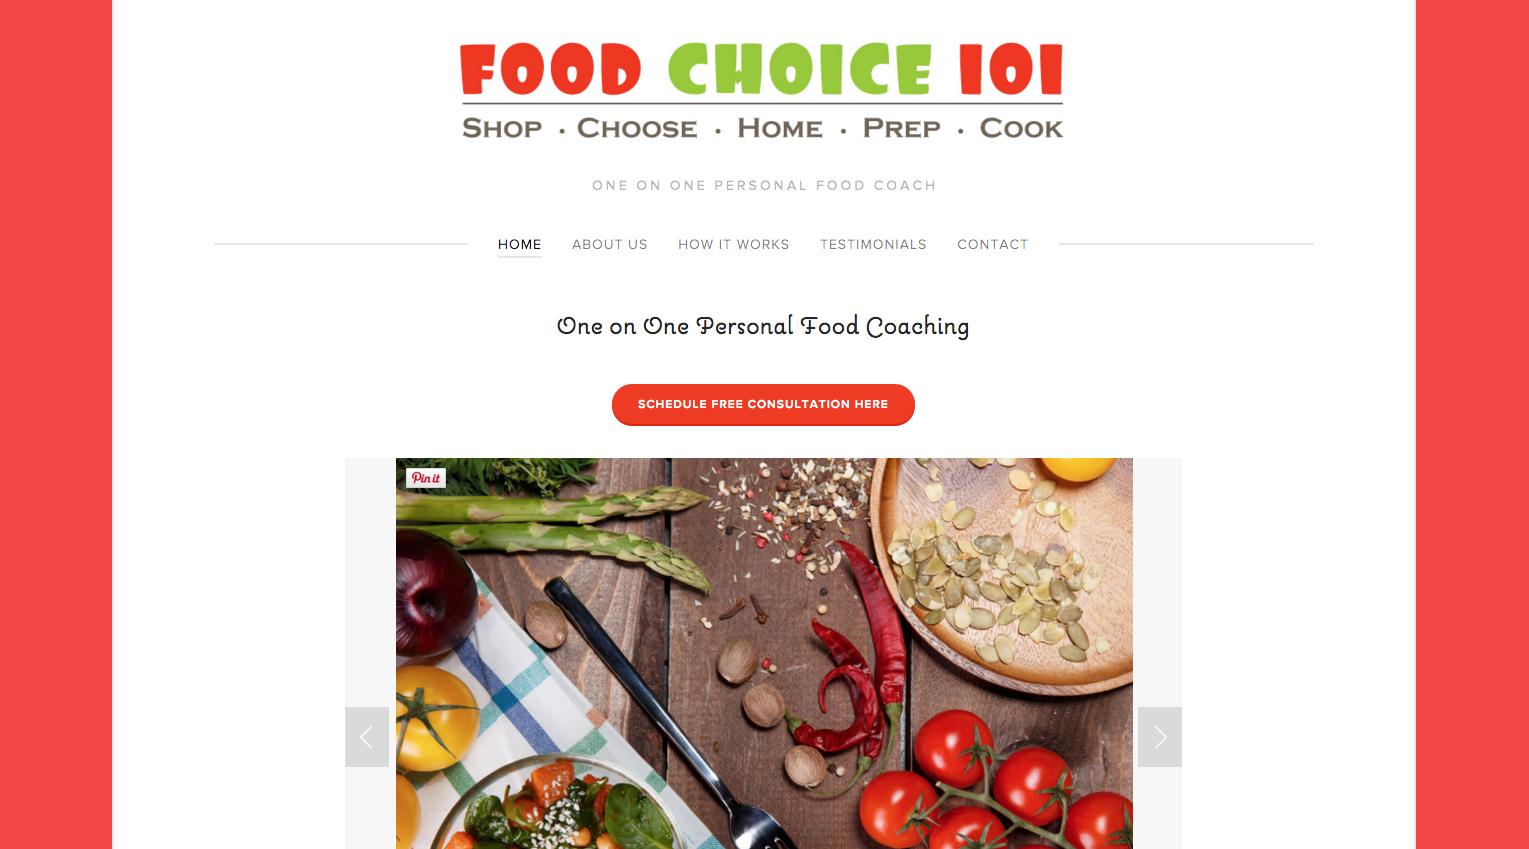 Food Choice 101